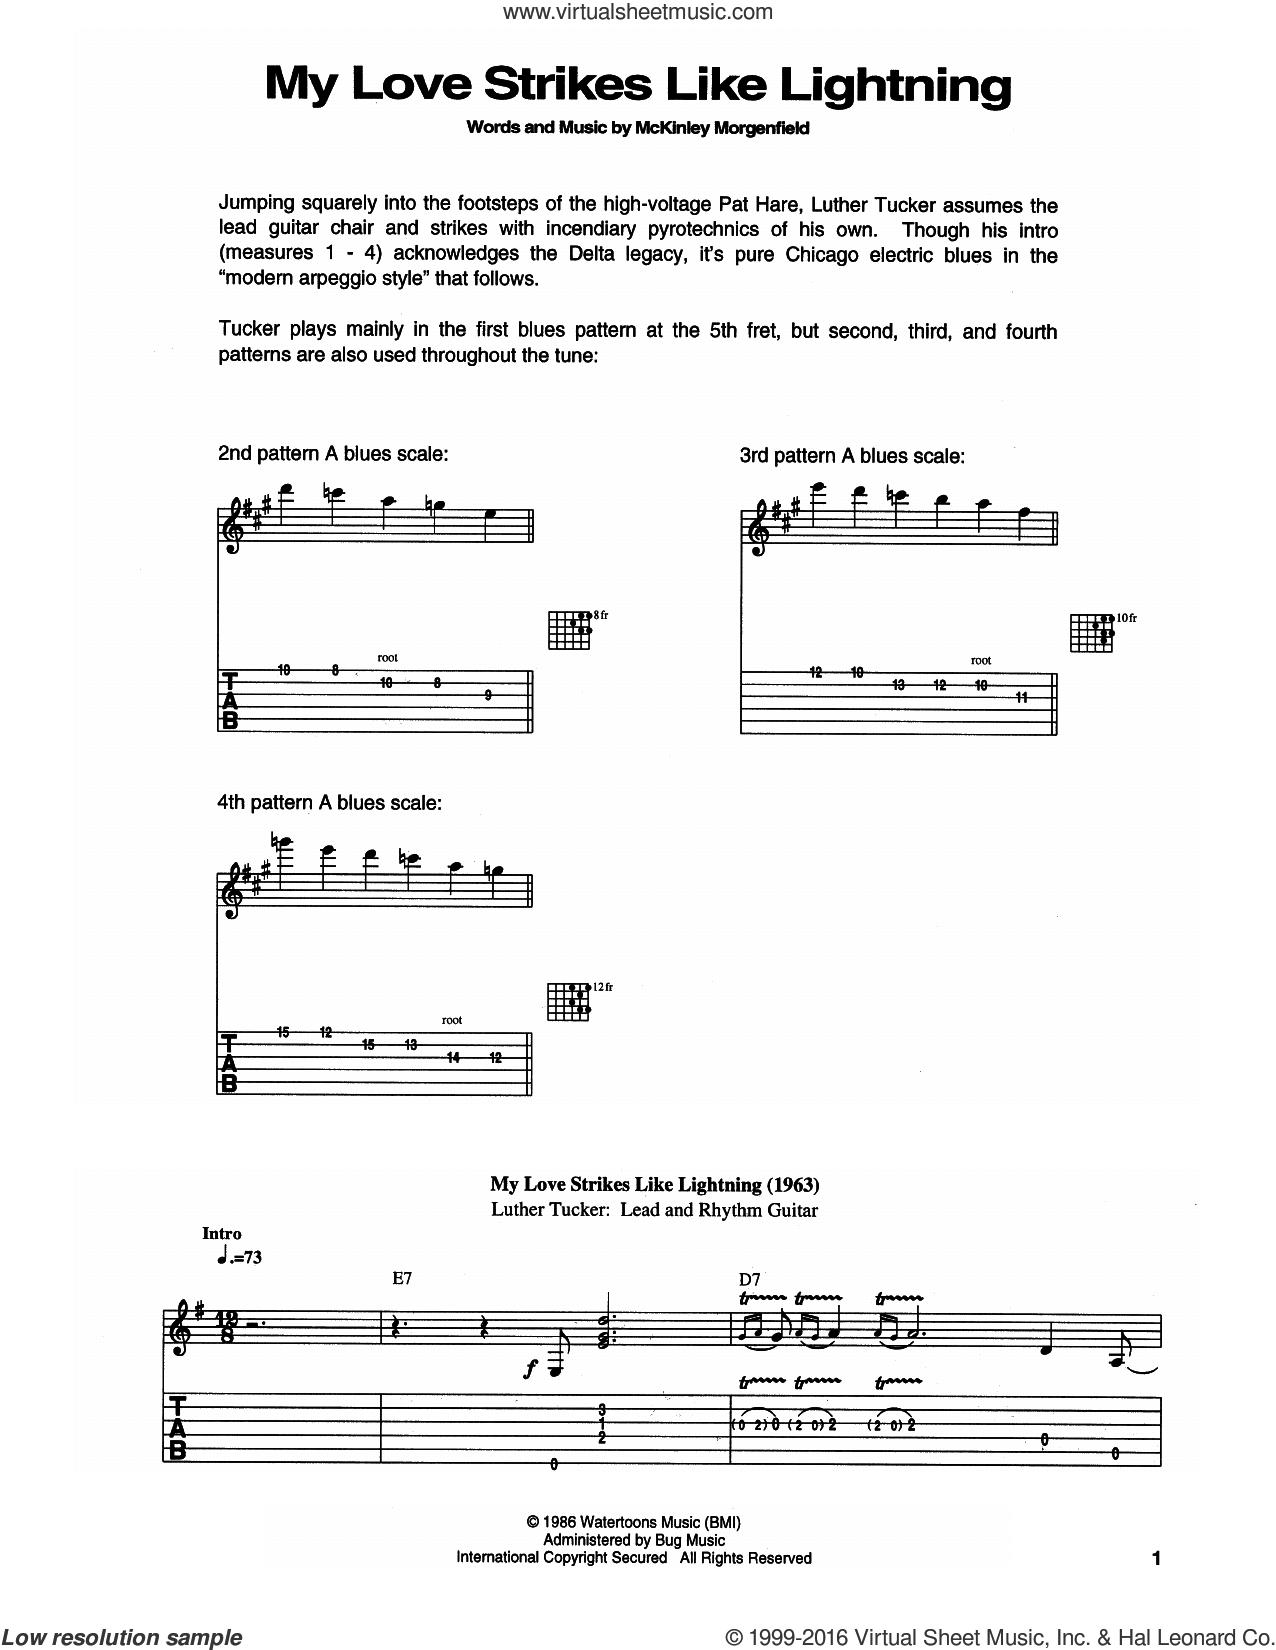 My Love Strikes Like Lightning sheet music for guitar (tablature) by Muddy Waters, intermediate skill level